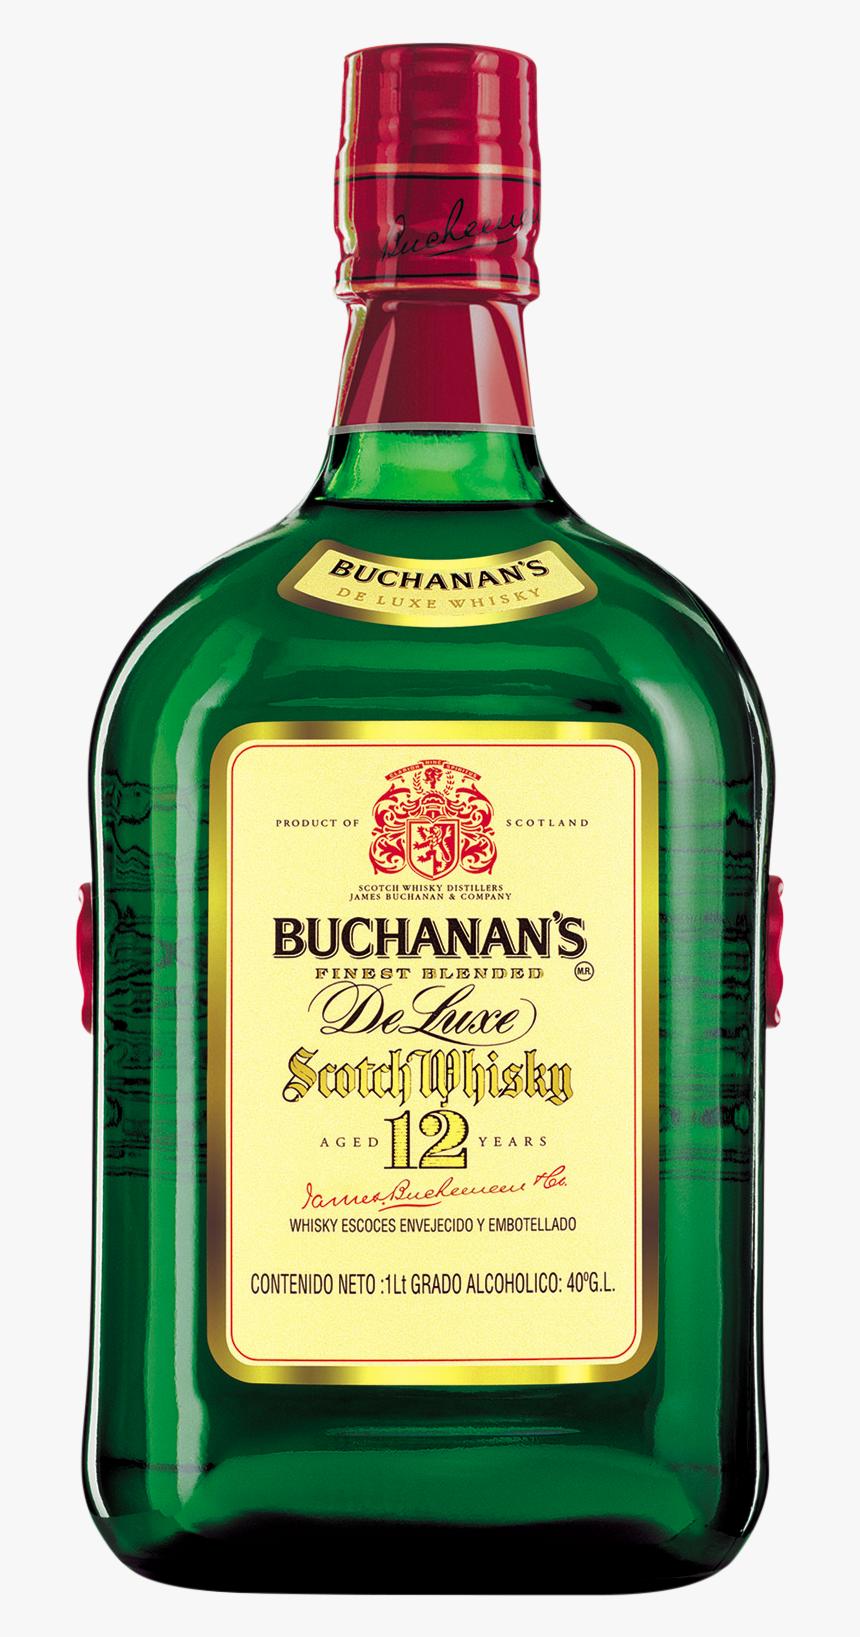 Corona Bottle Png - Buchanans 12, Transparent Png, Free Download